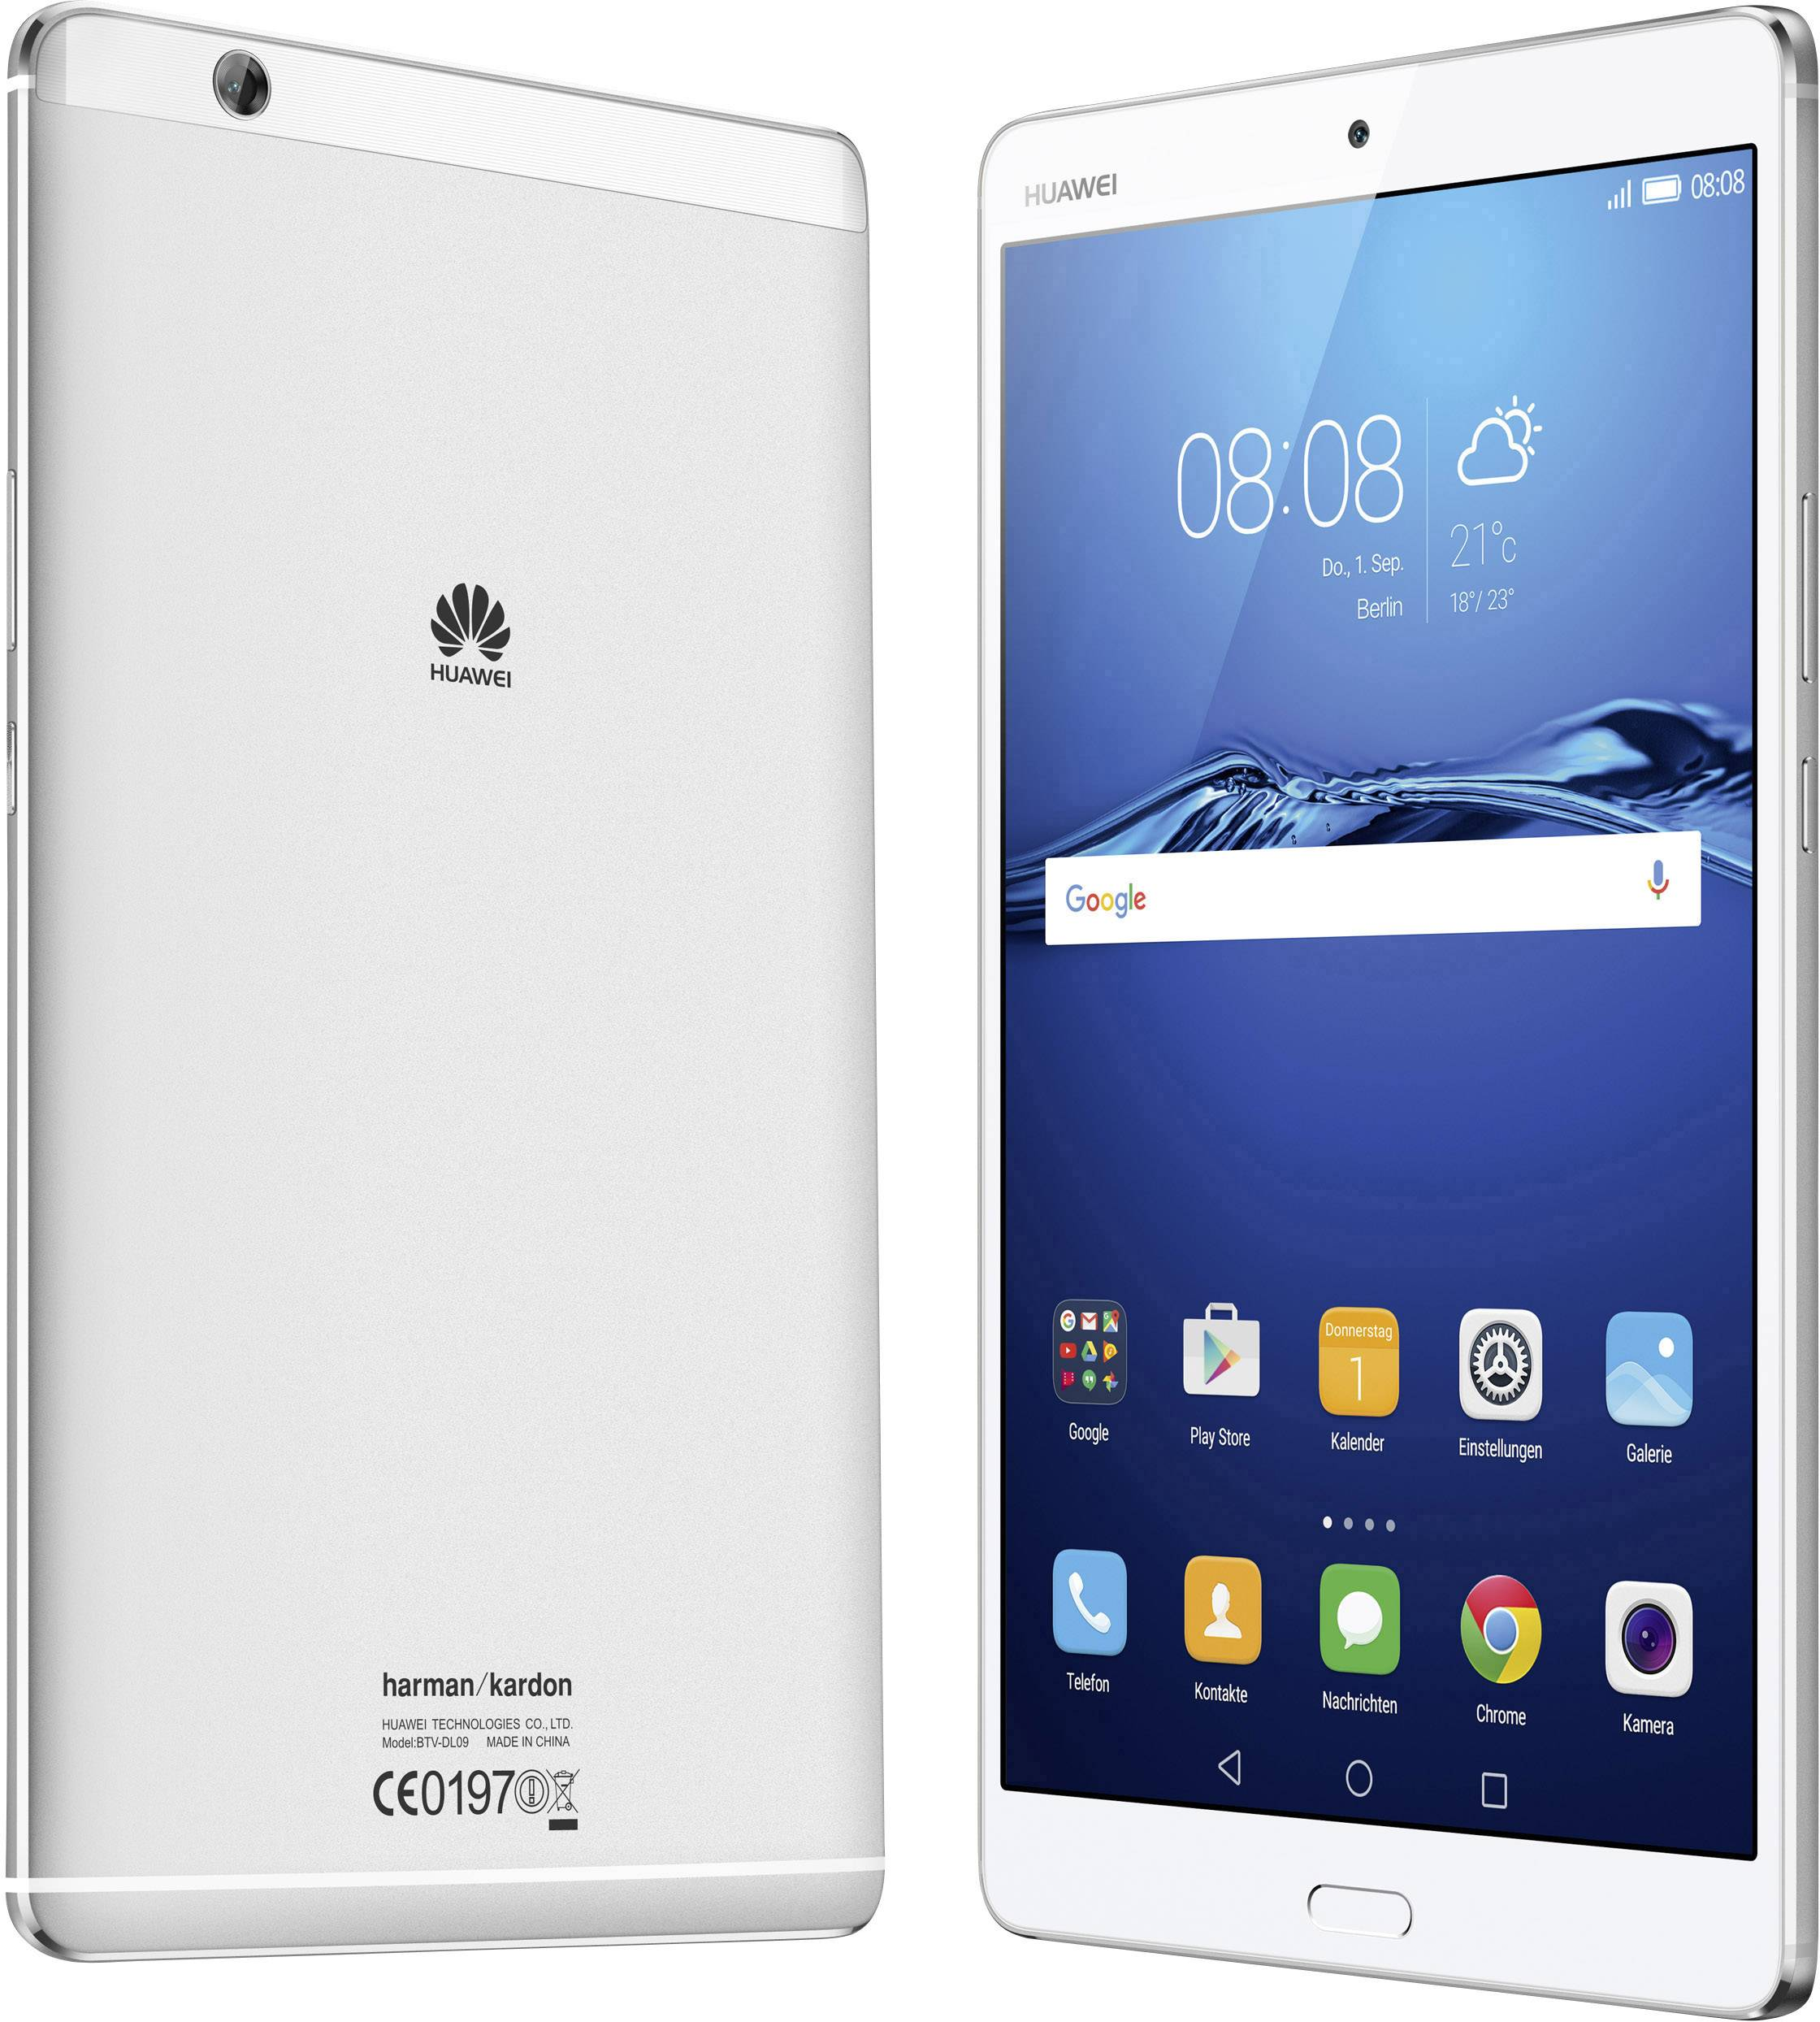 Huawei Mediapad M3 Android 8